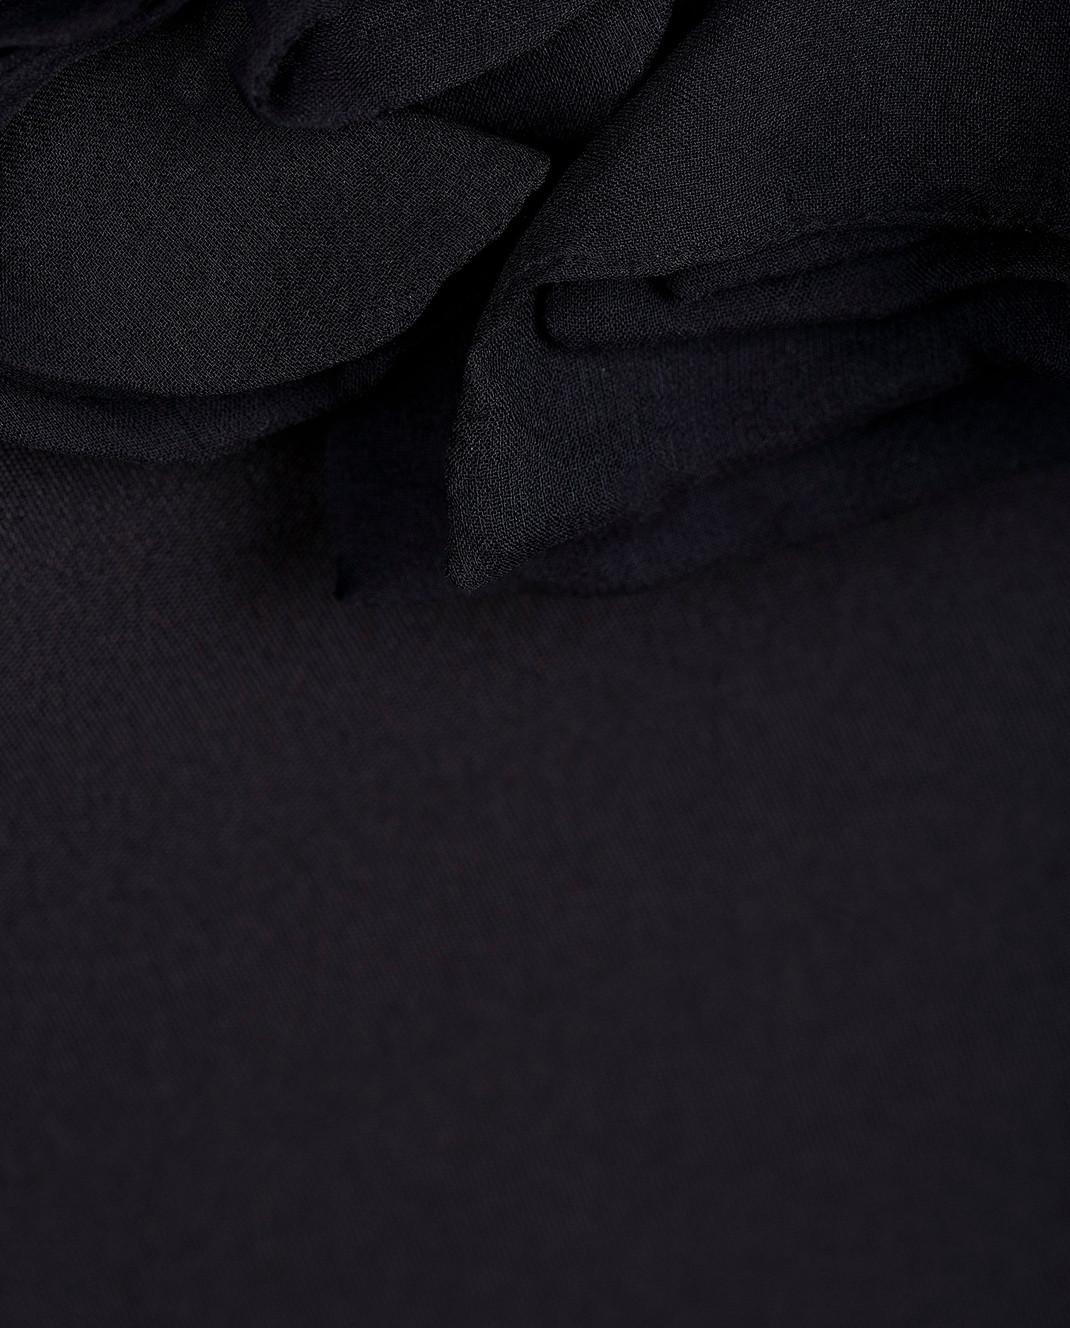 Valentino Черное платье из шелка B0AB3S0 изображение 5